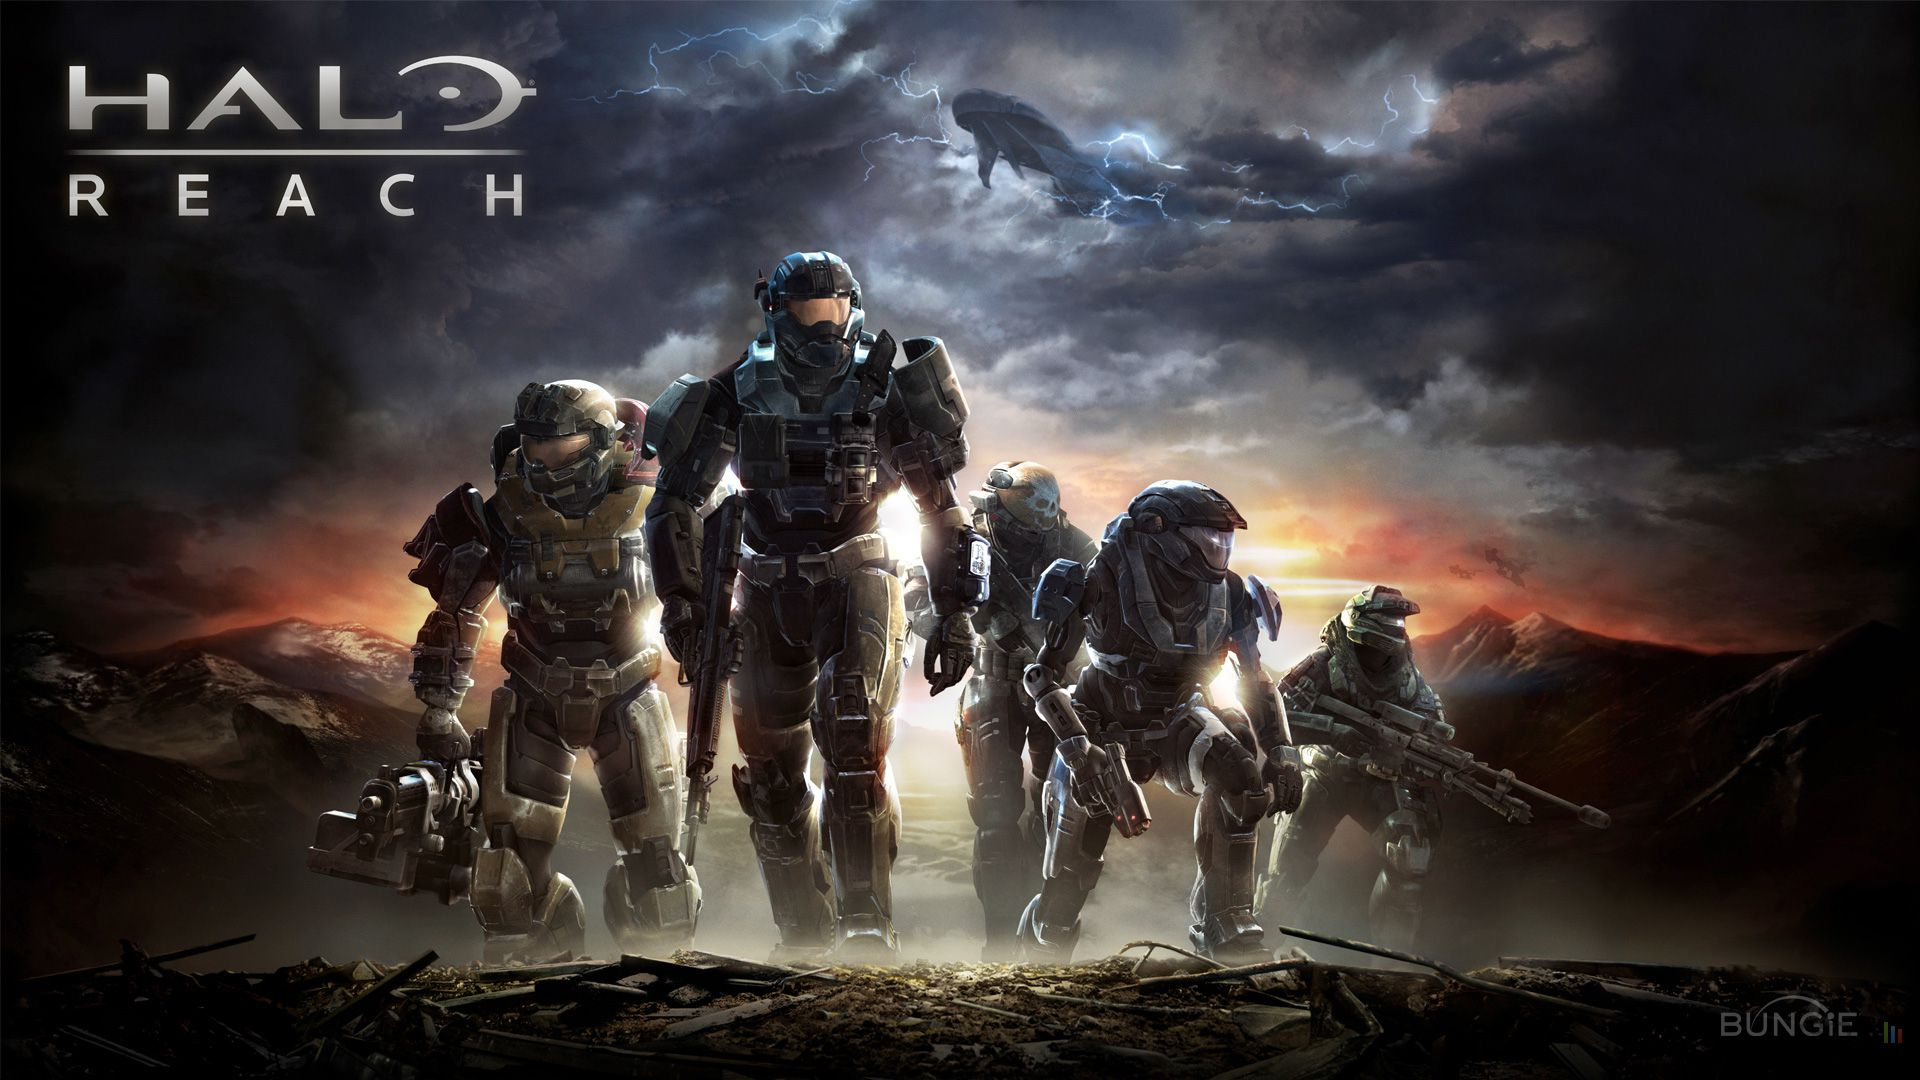 Image Halo Reach (5)